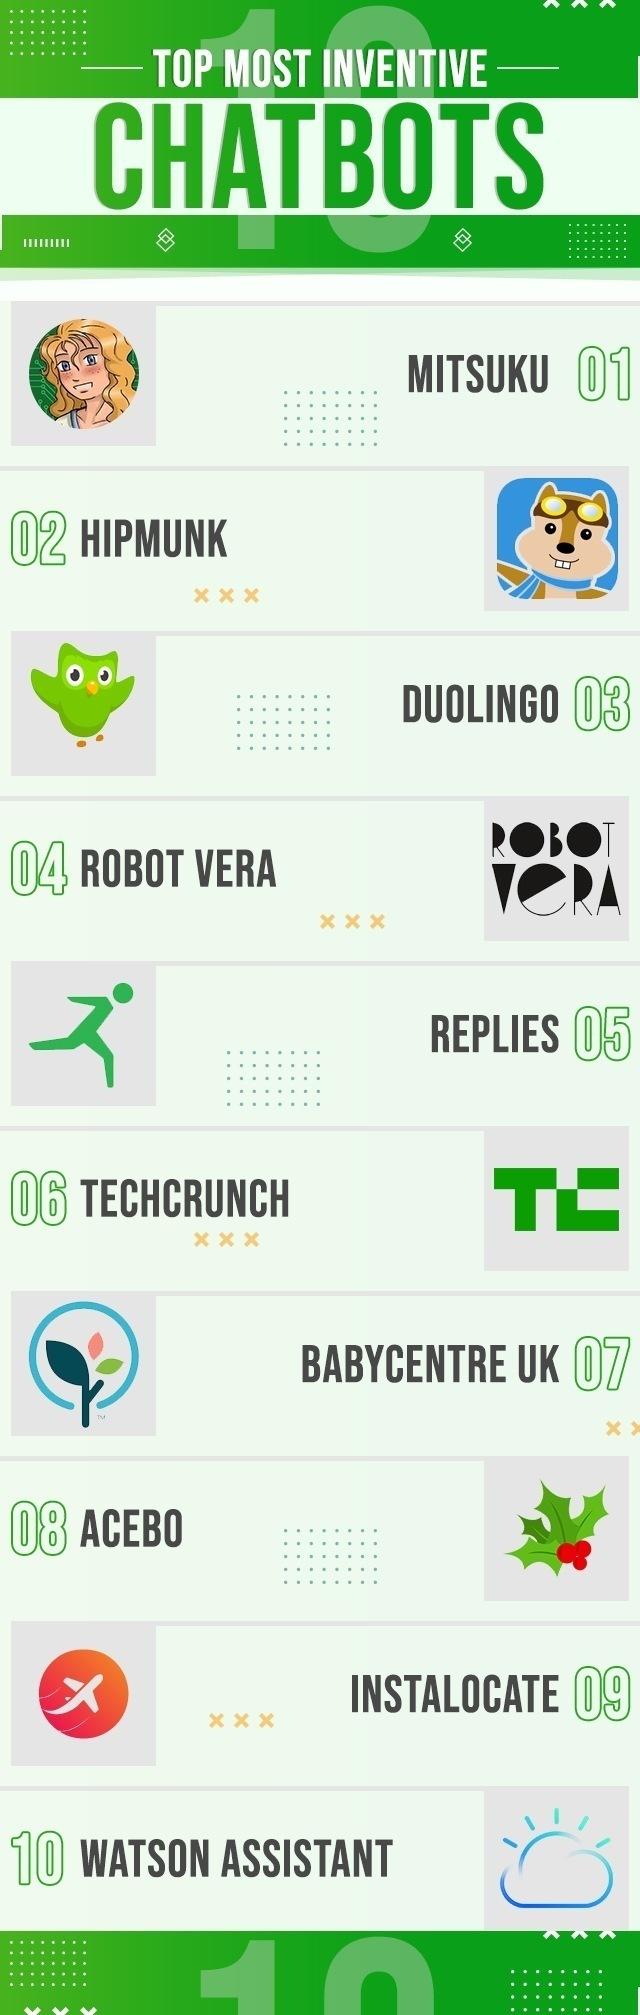 10 Best chatbot apps